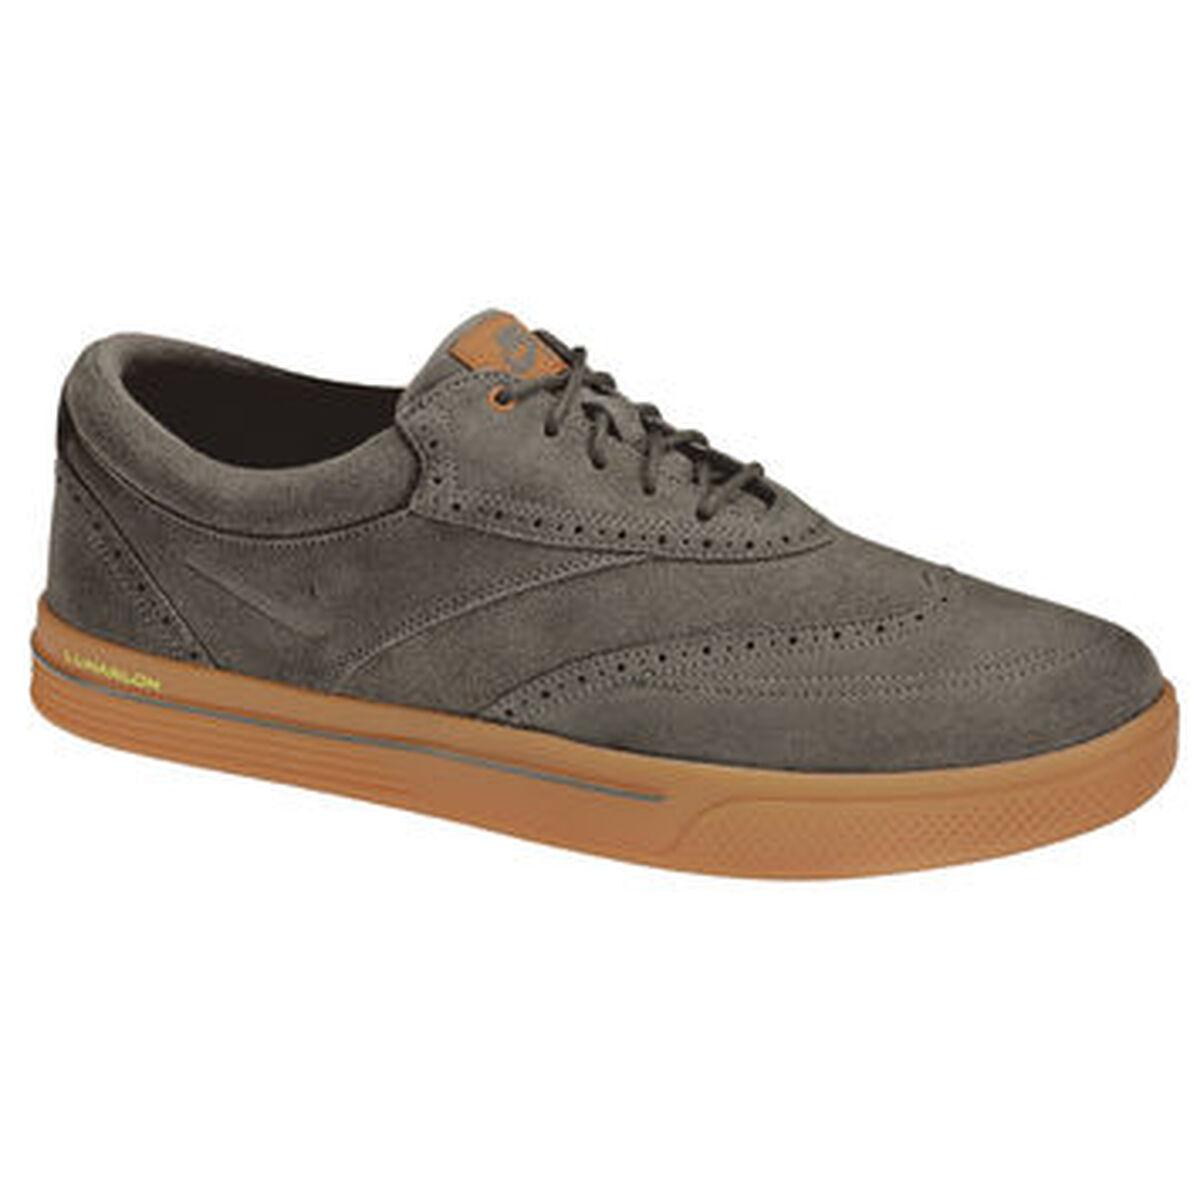 d2f22d242ae63 Nike Lunar Swingtip Suede Men's Golf Shoe - Brown